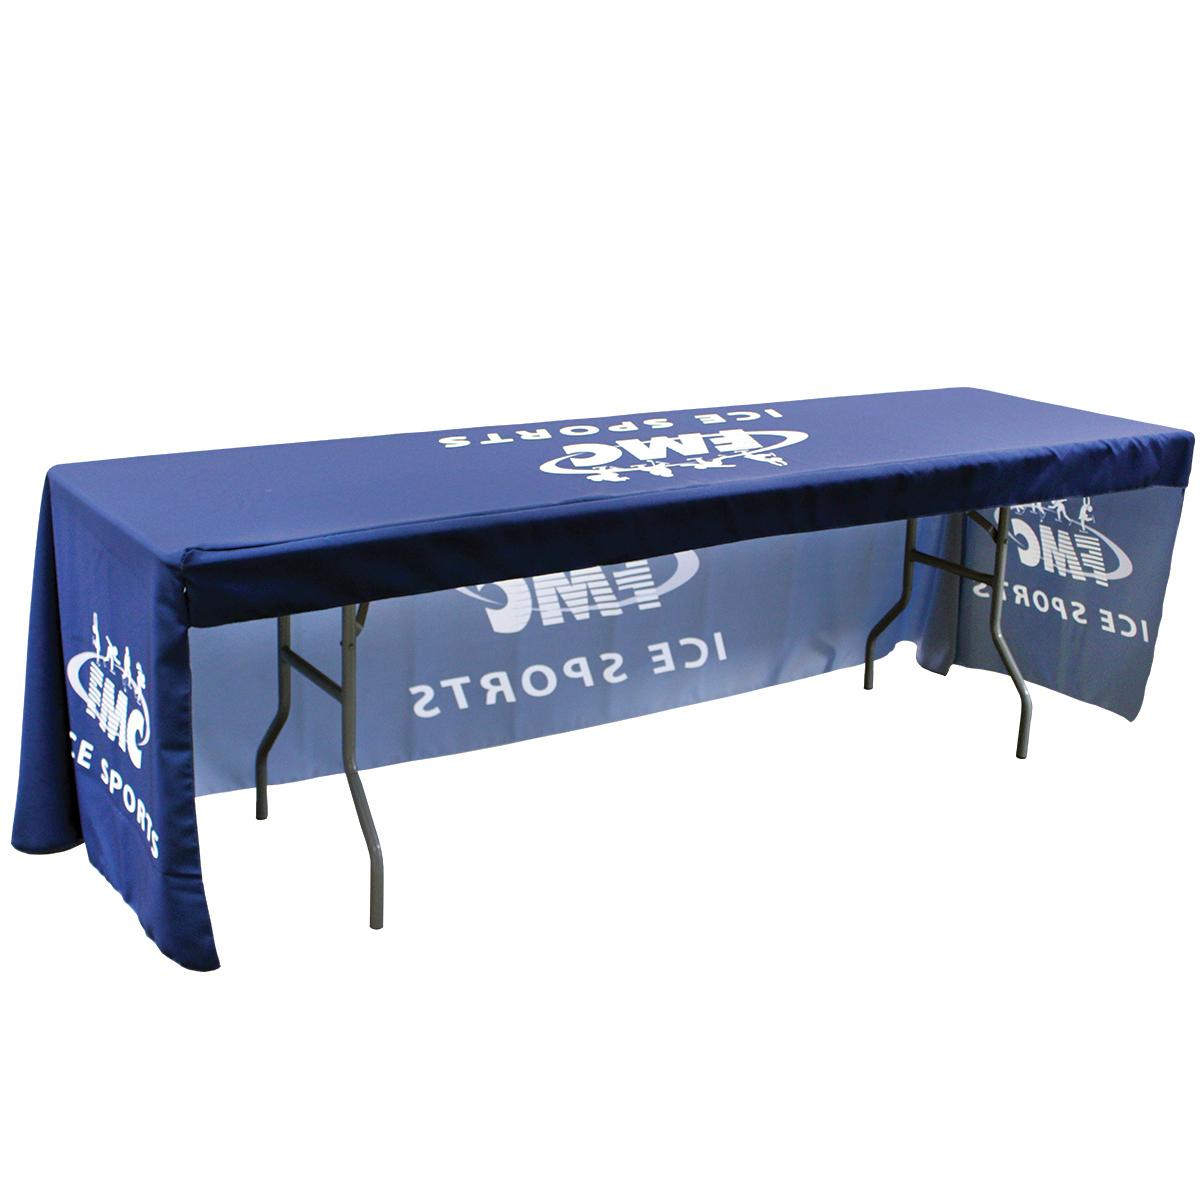 TC96HDDRAPED3-8-ft-draped-table-cover-2-amazon.jpg